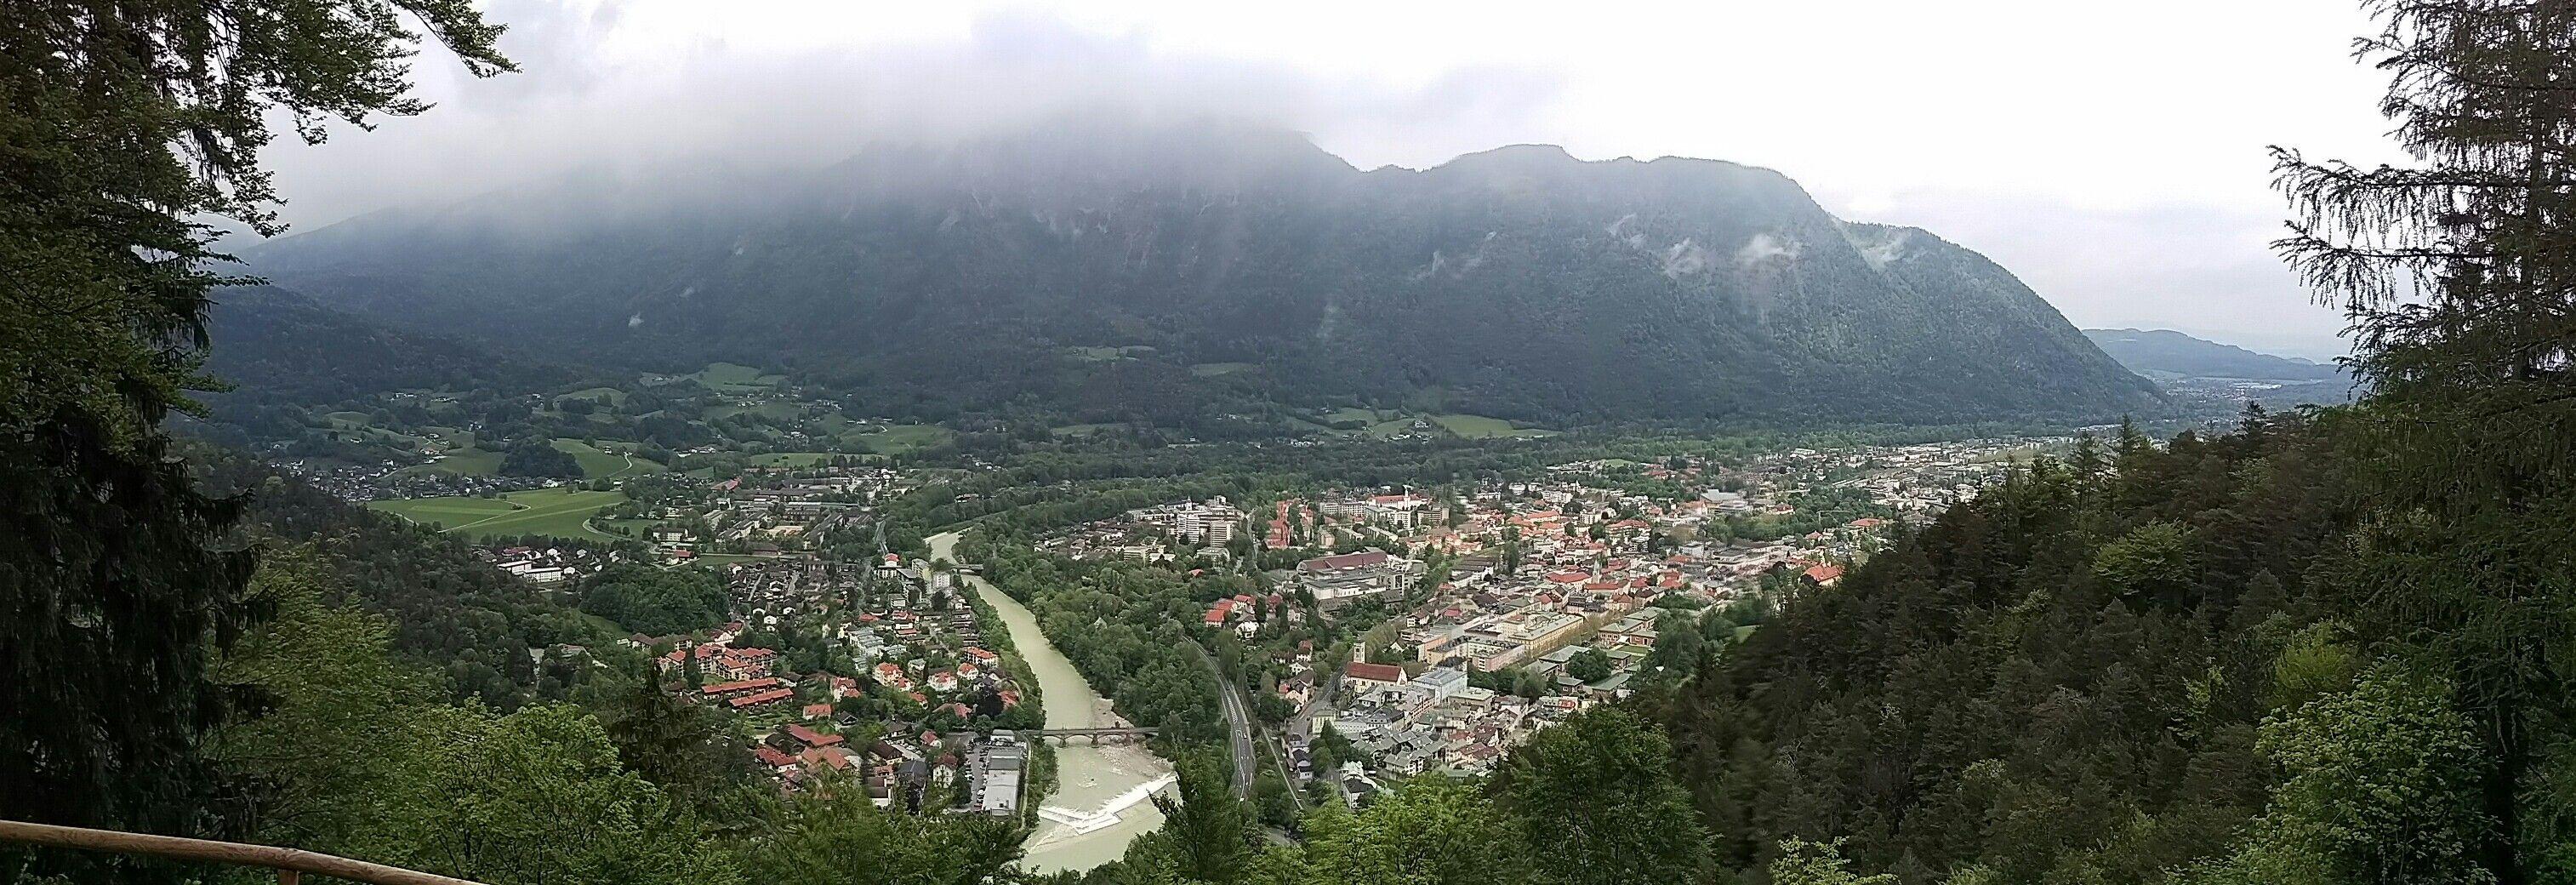 Bad Reichenhall - cloudy day